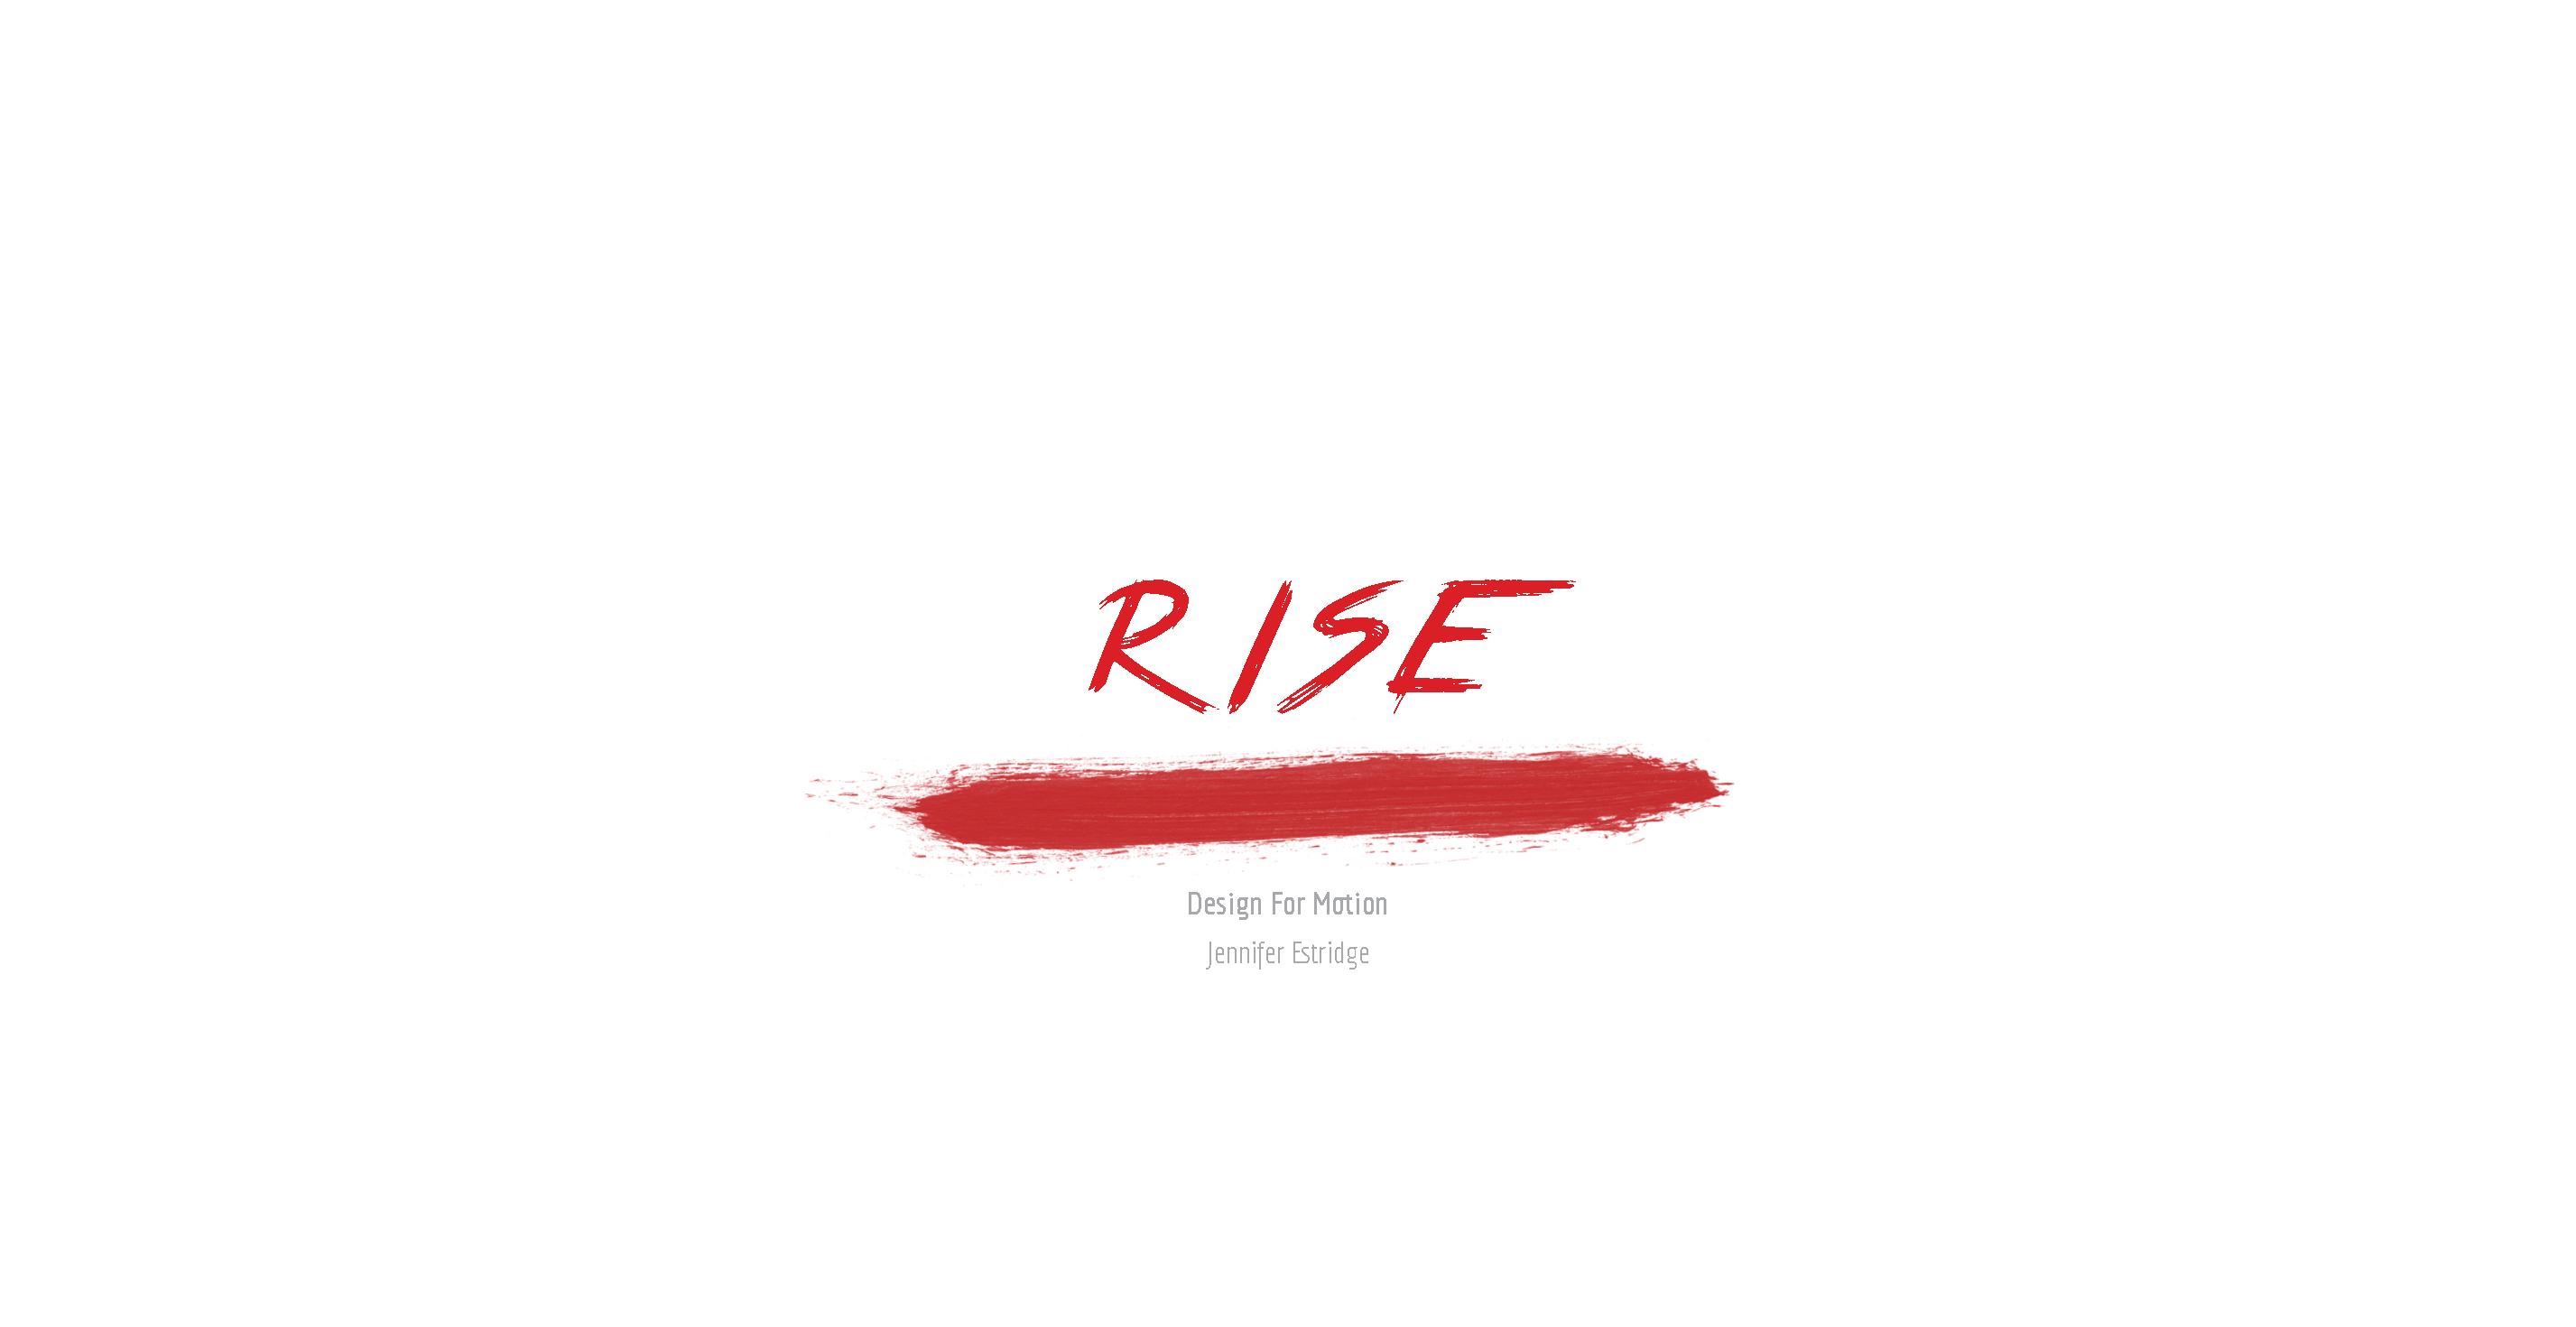 illustrationprocessbook_rise_jenniferestridge_Page_01